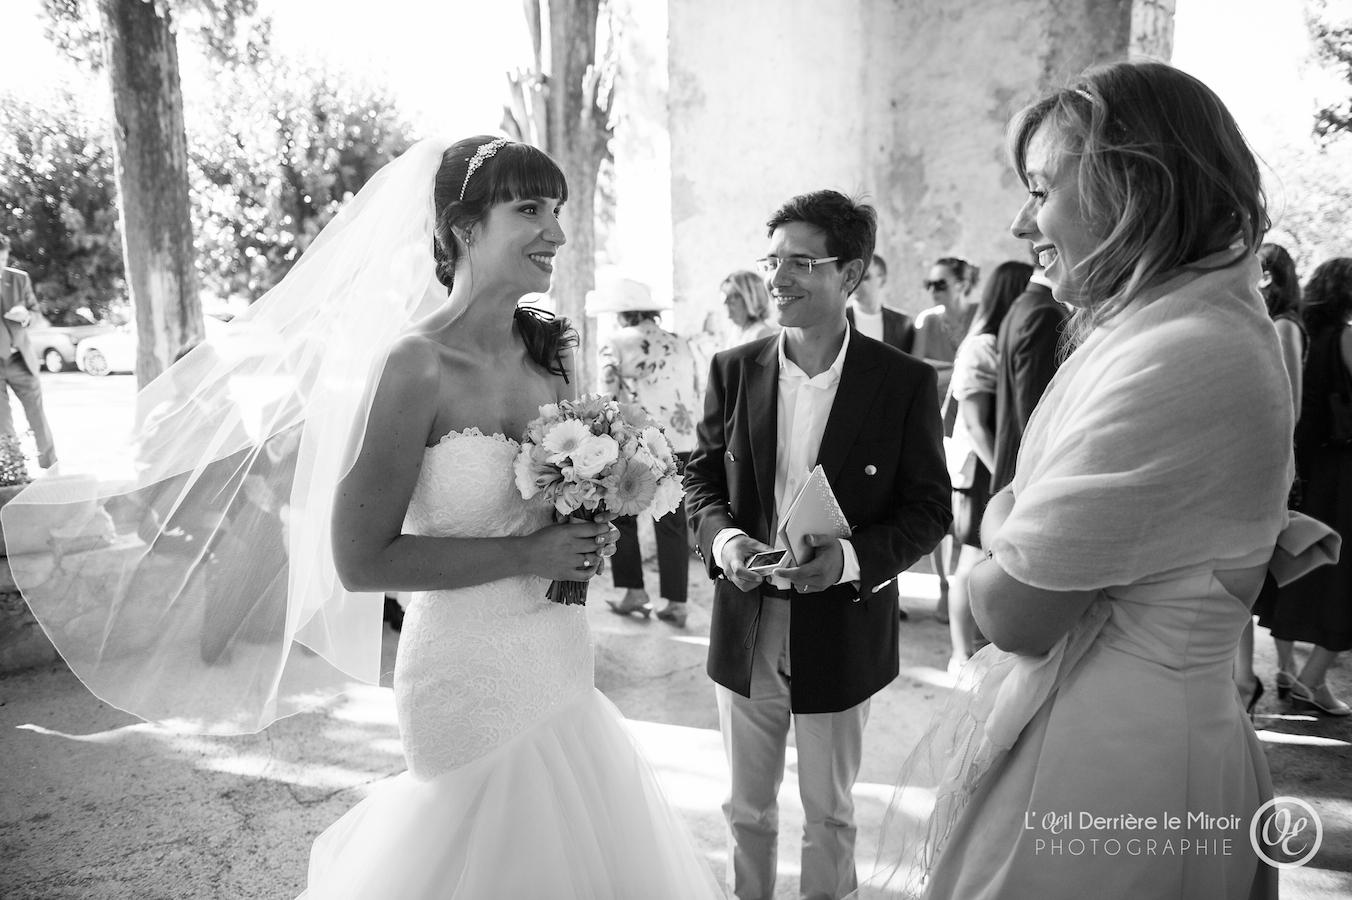 Photographe-Fayence-loeilderrierelemiroir-025